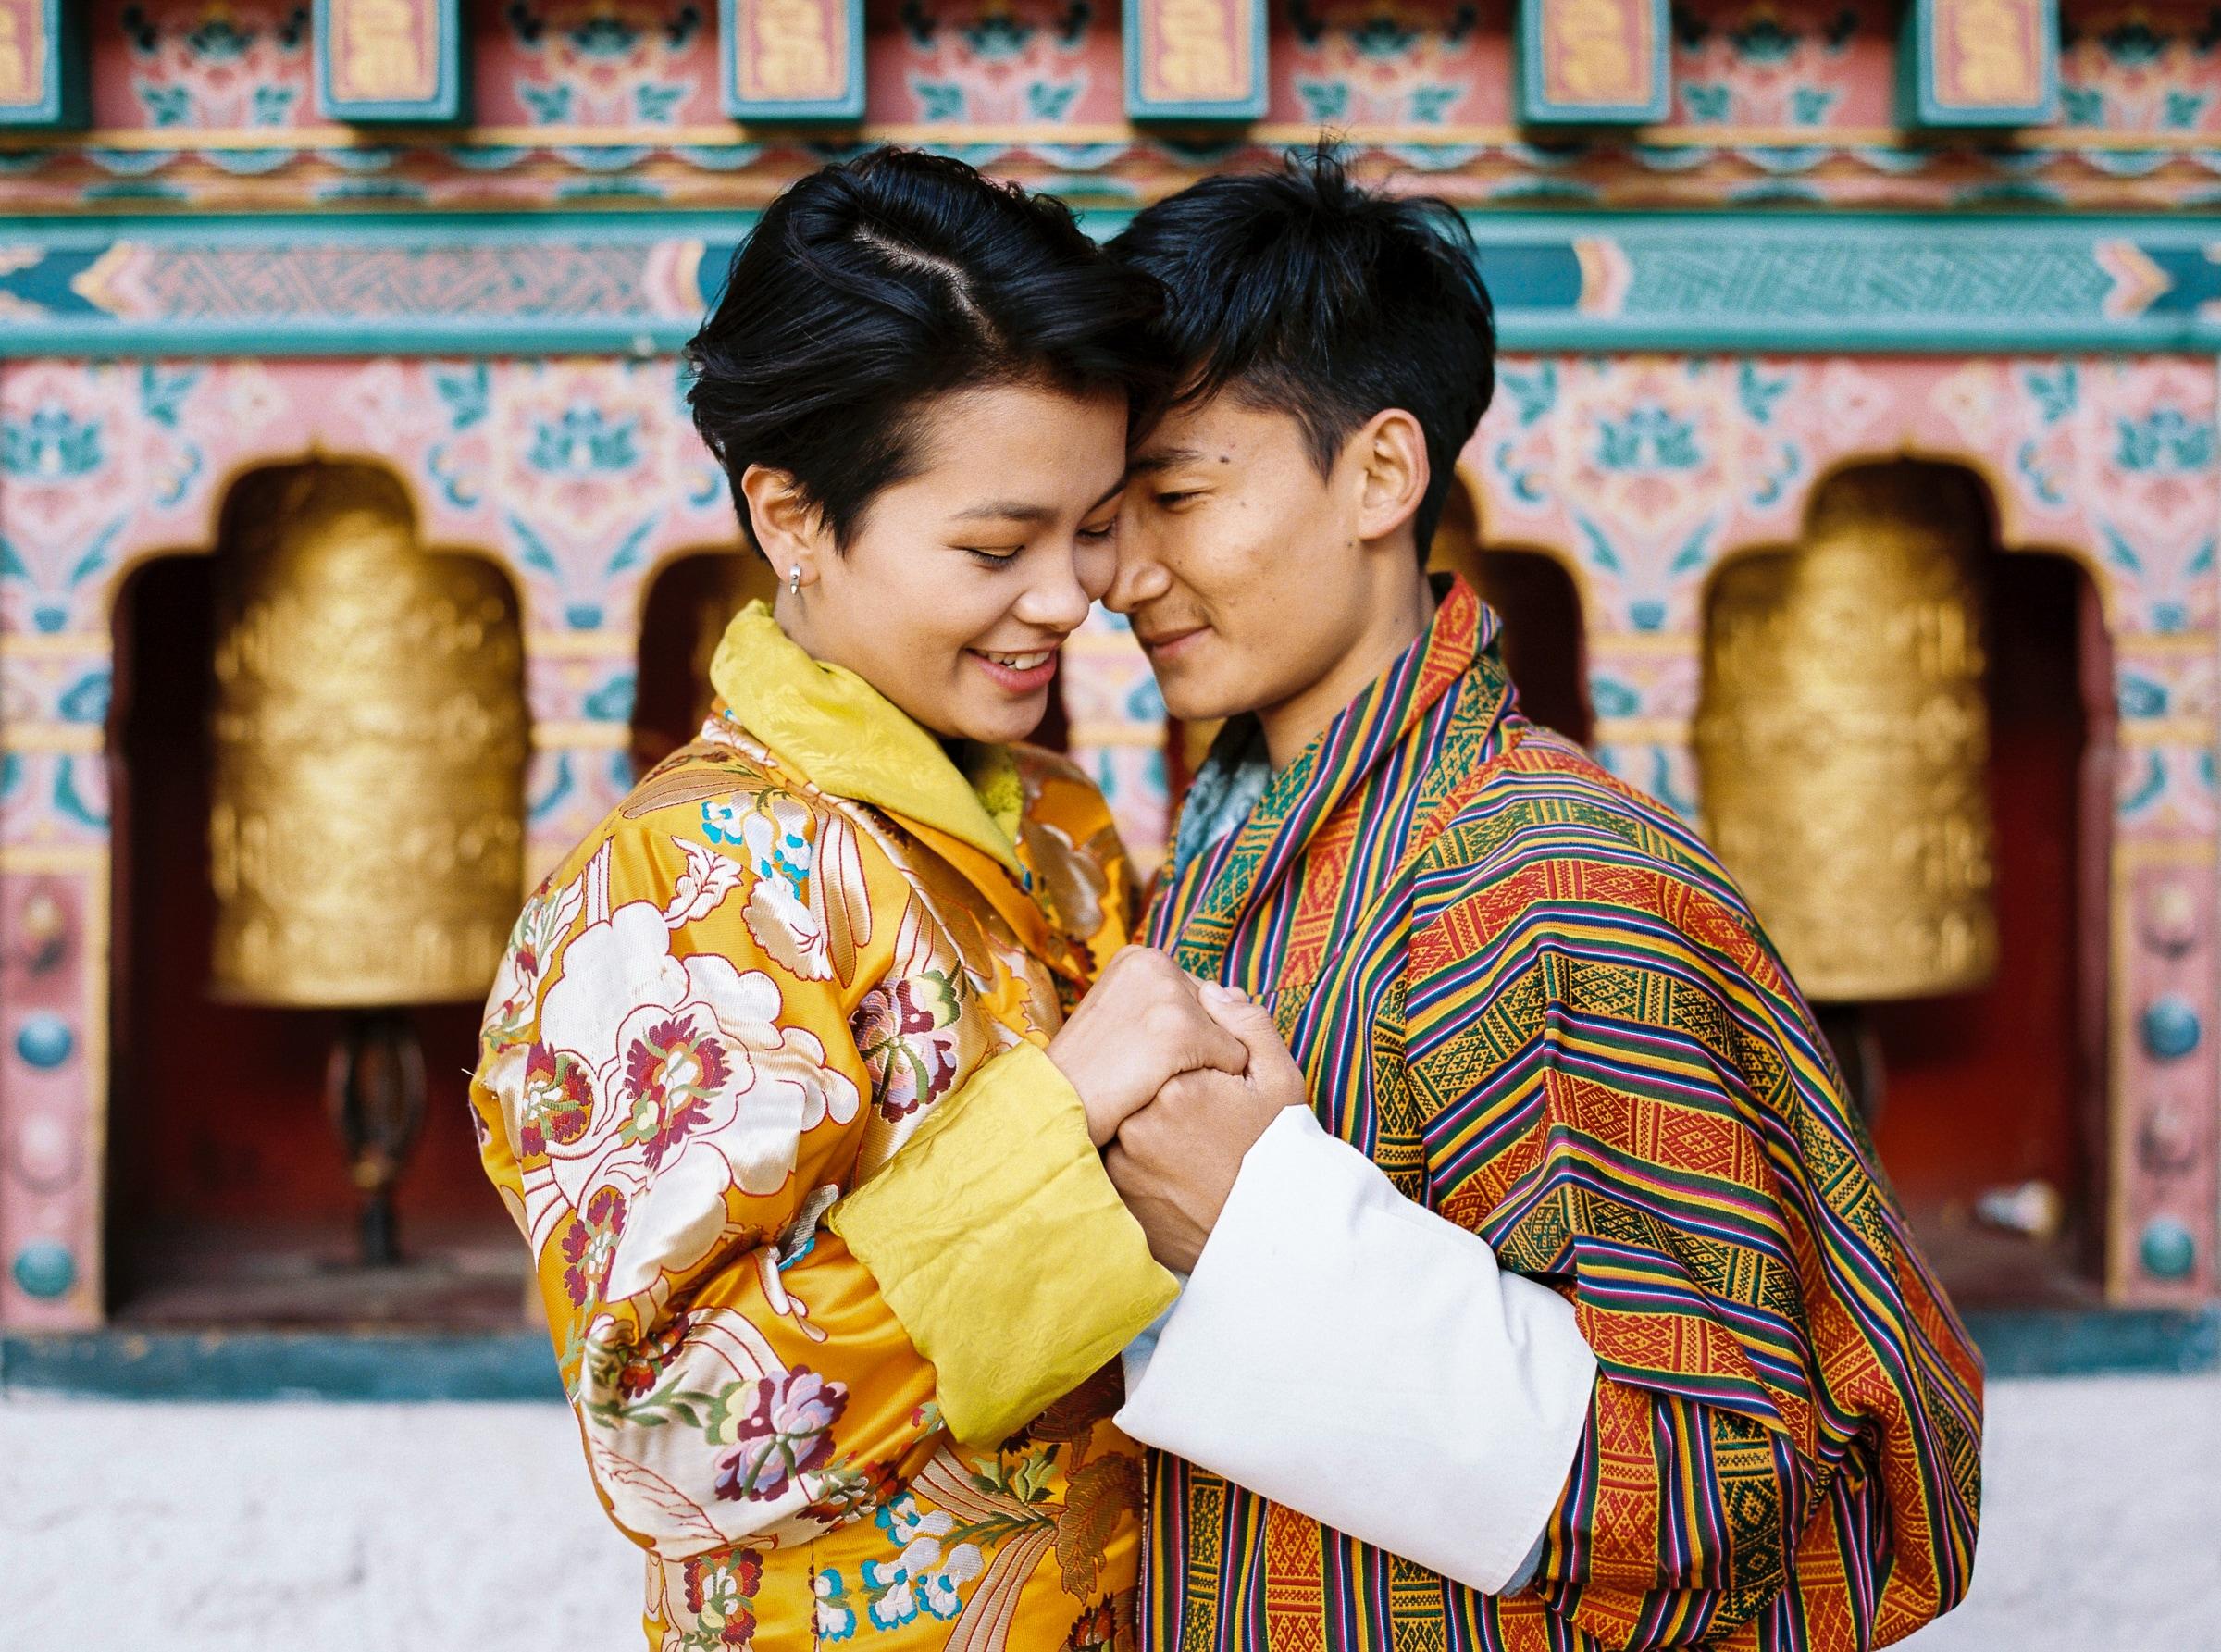 couple-against-temple-with-prayer-wheels-sylvain-bouzat-wedding-photographer